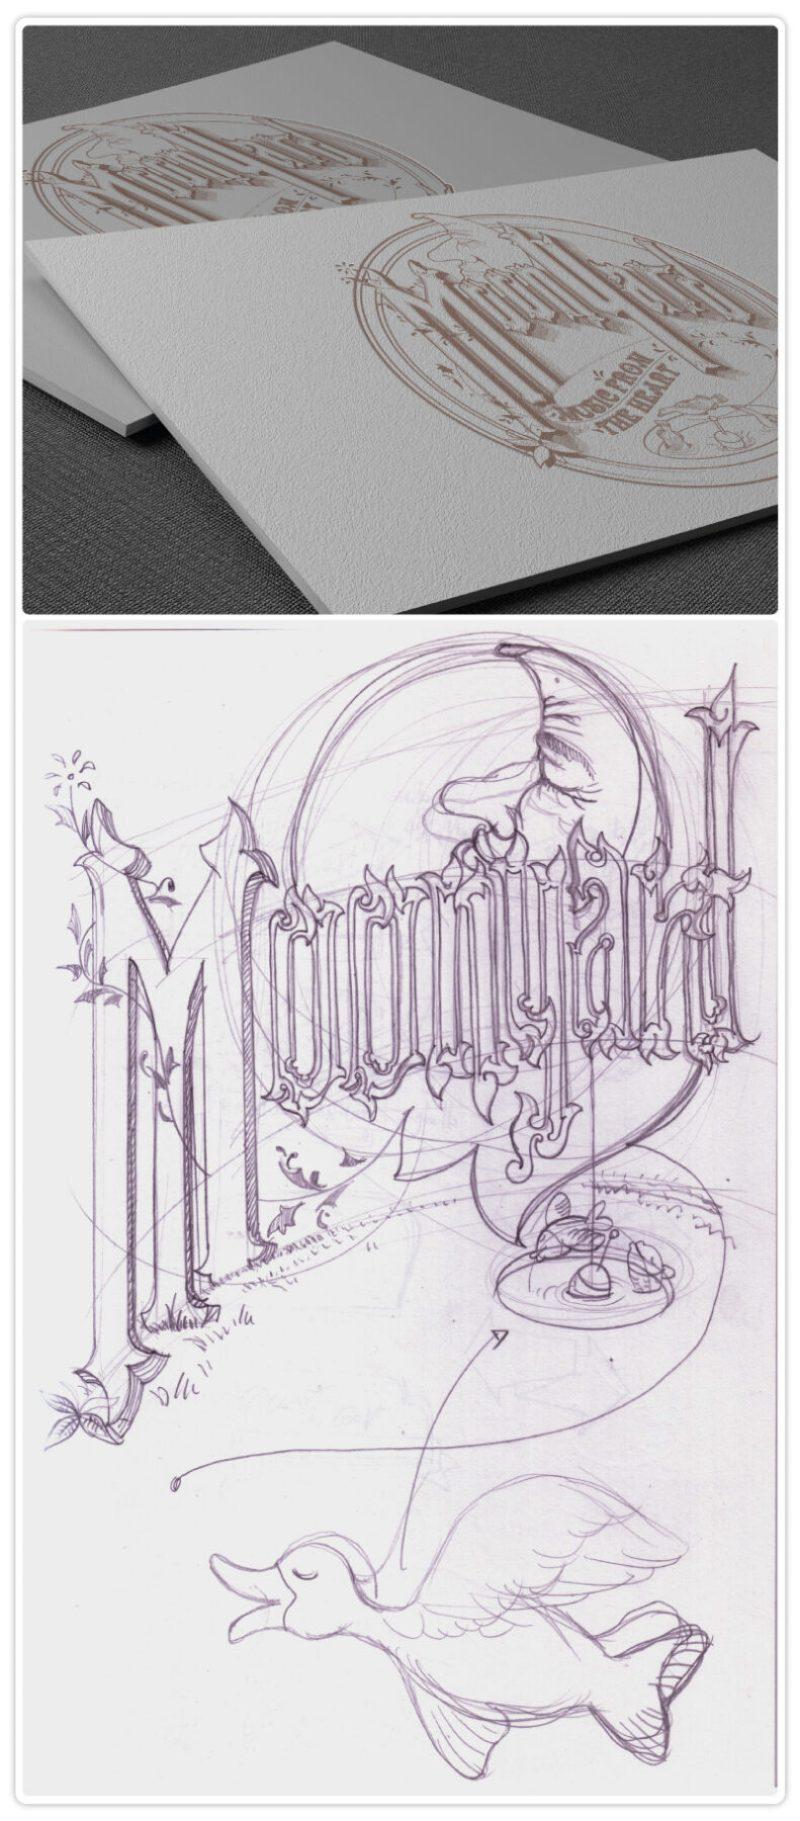 MoonYard logo sketch